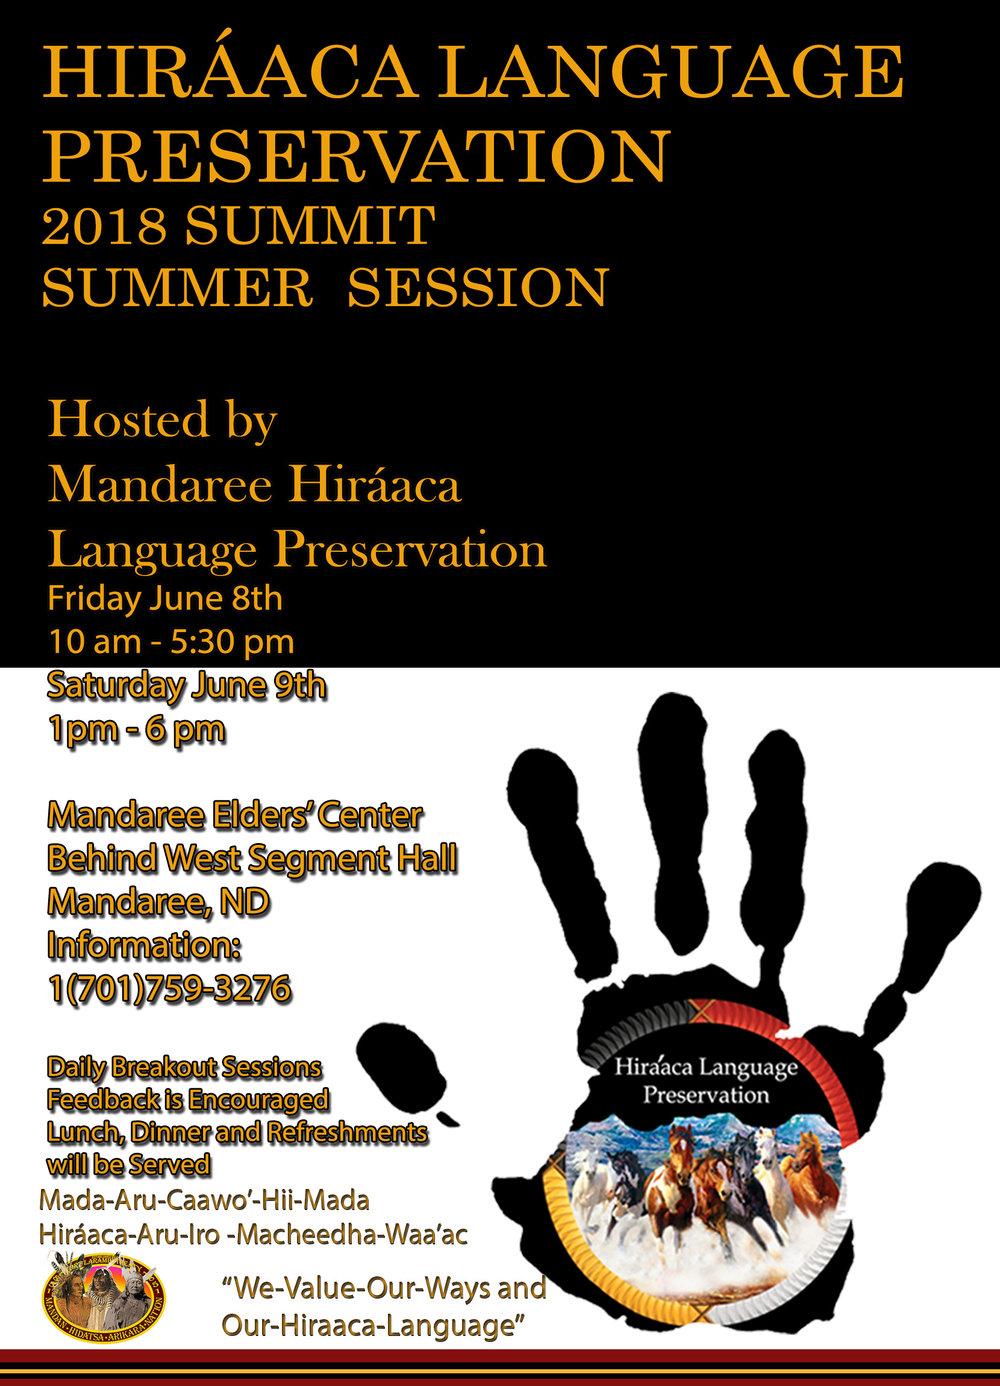 Hiraaca language Preservation 2018 Summit Summer Session.jpg